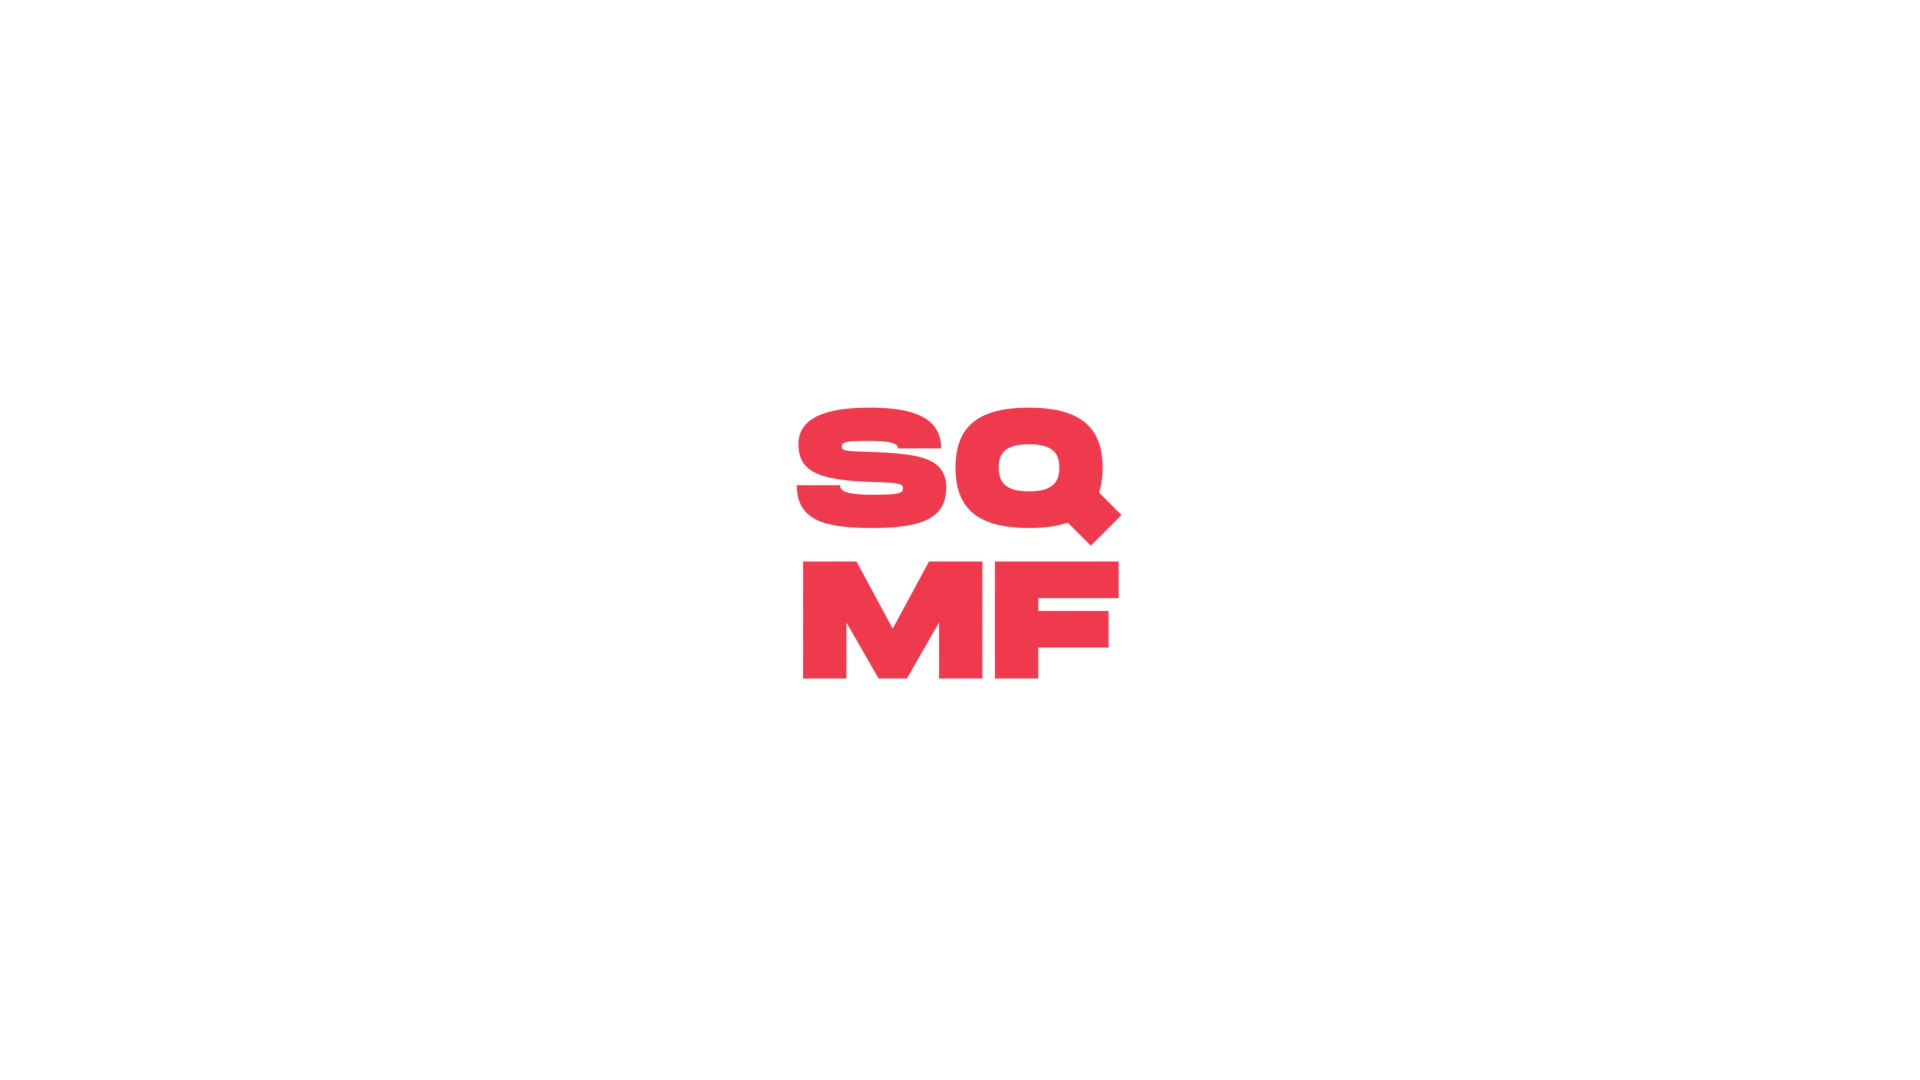 sqmf banner 3.mov